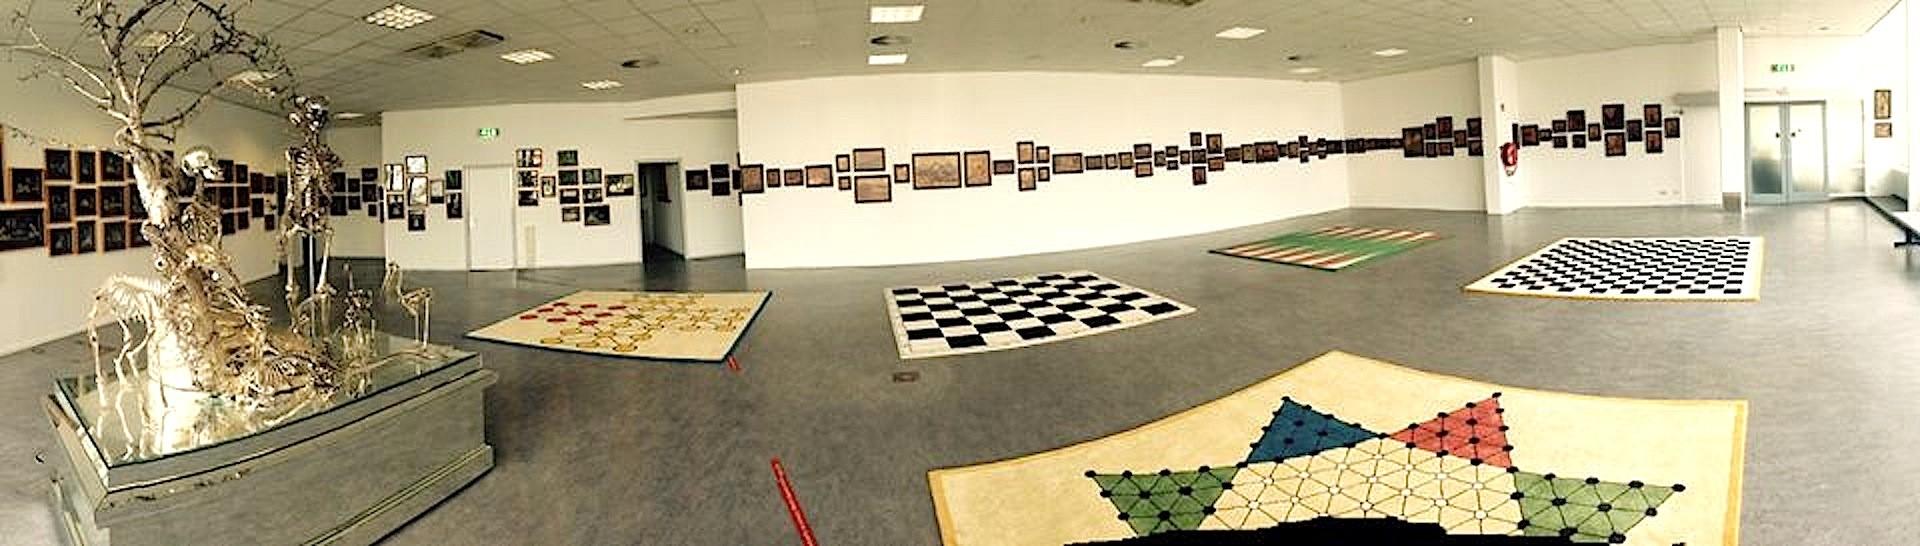 Monika Jordense Michalski – Panorama grote zaal Rob Scholte Museum